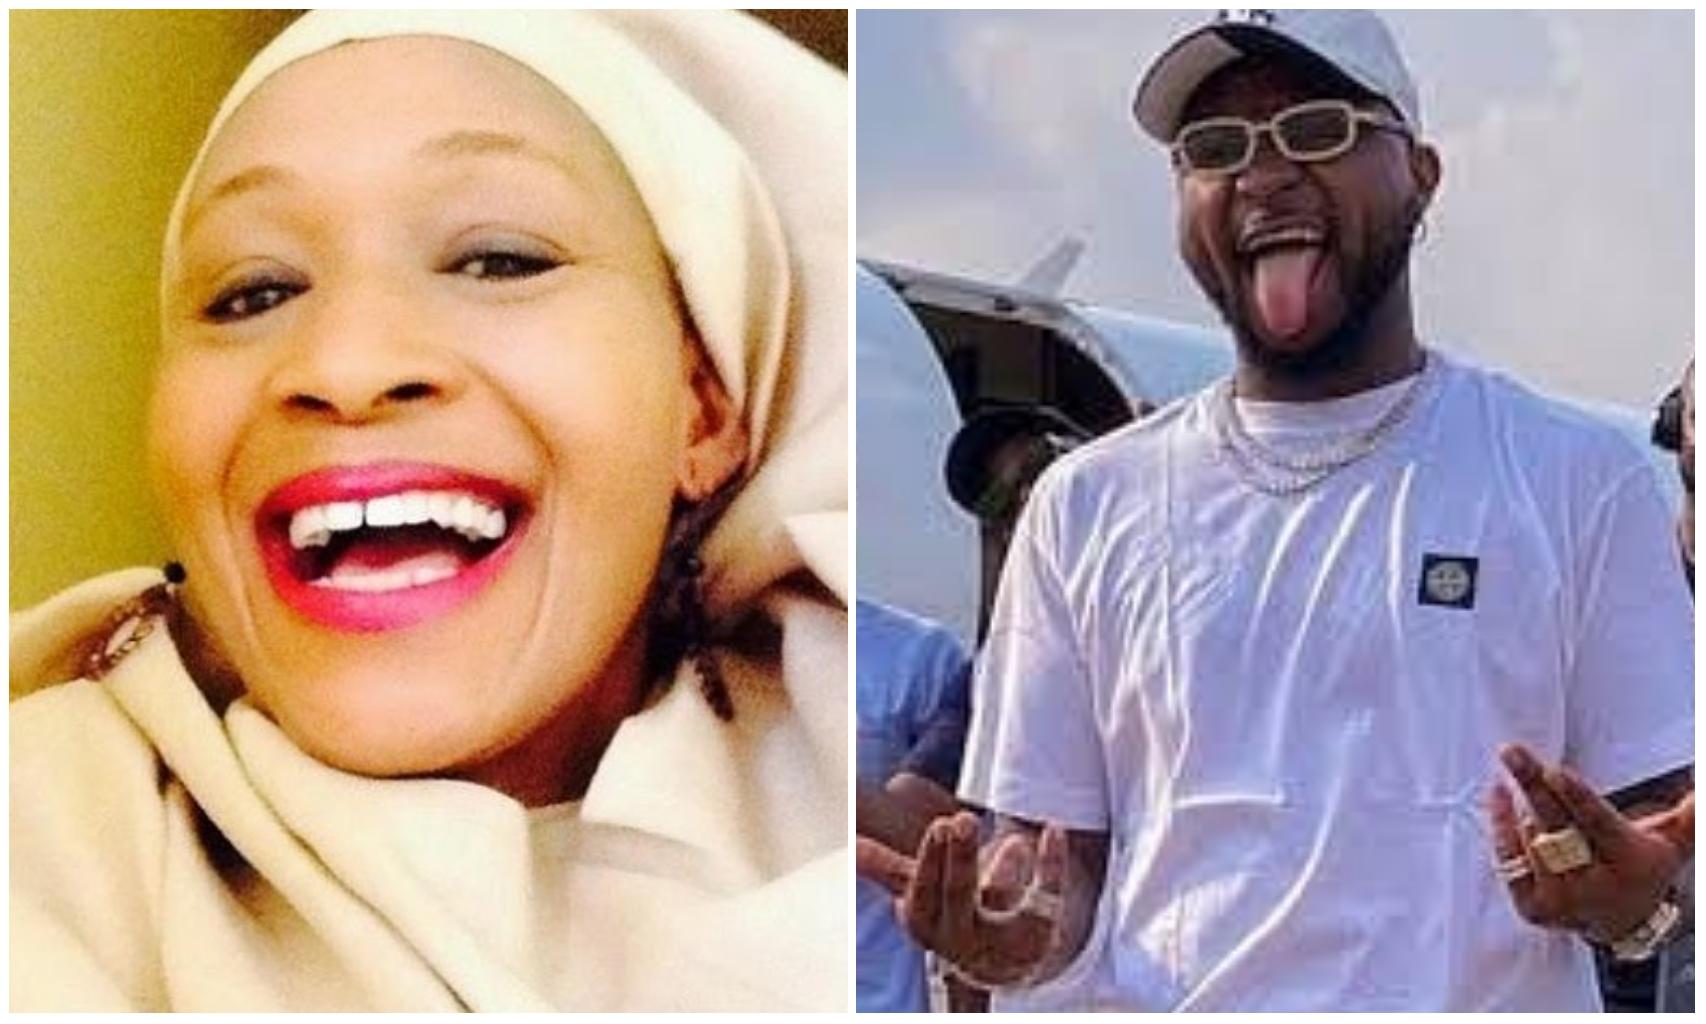 The God I worship will deal with Davido mercilessly – Kemi Olunloyo rants